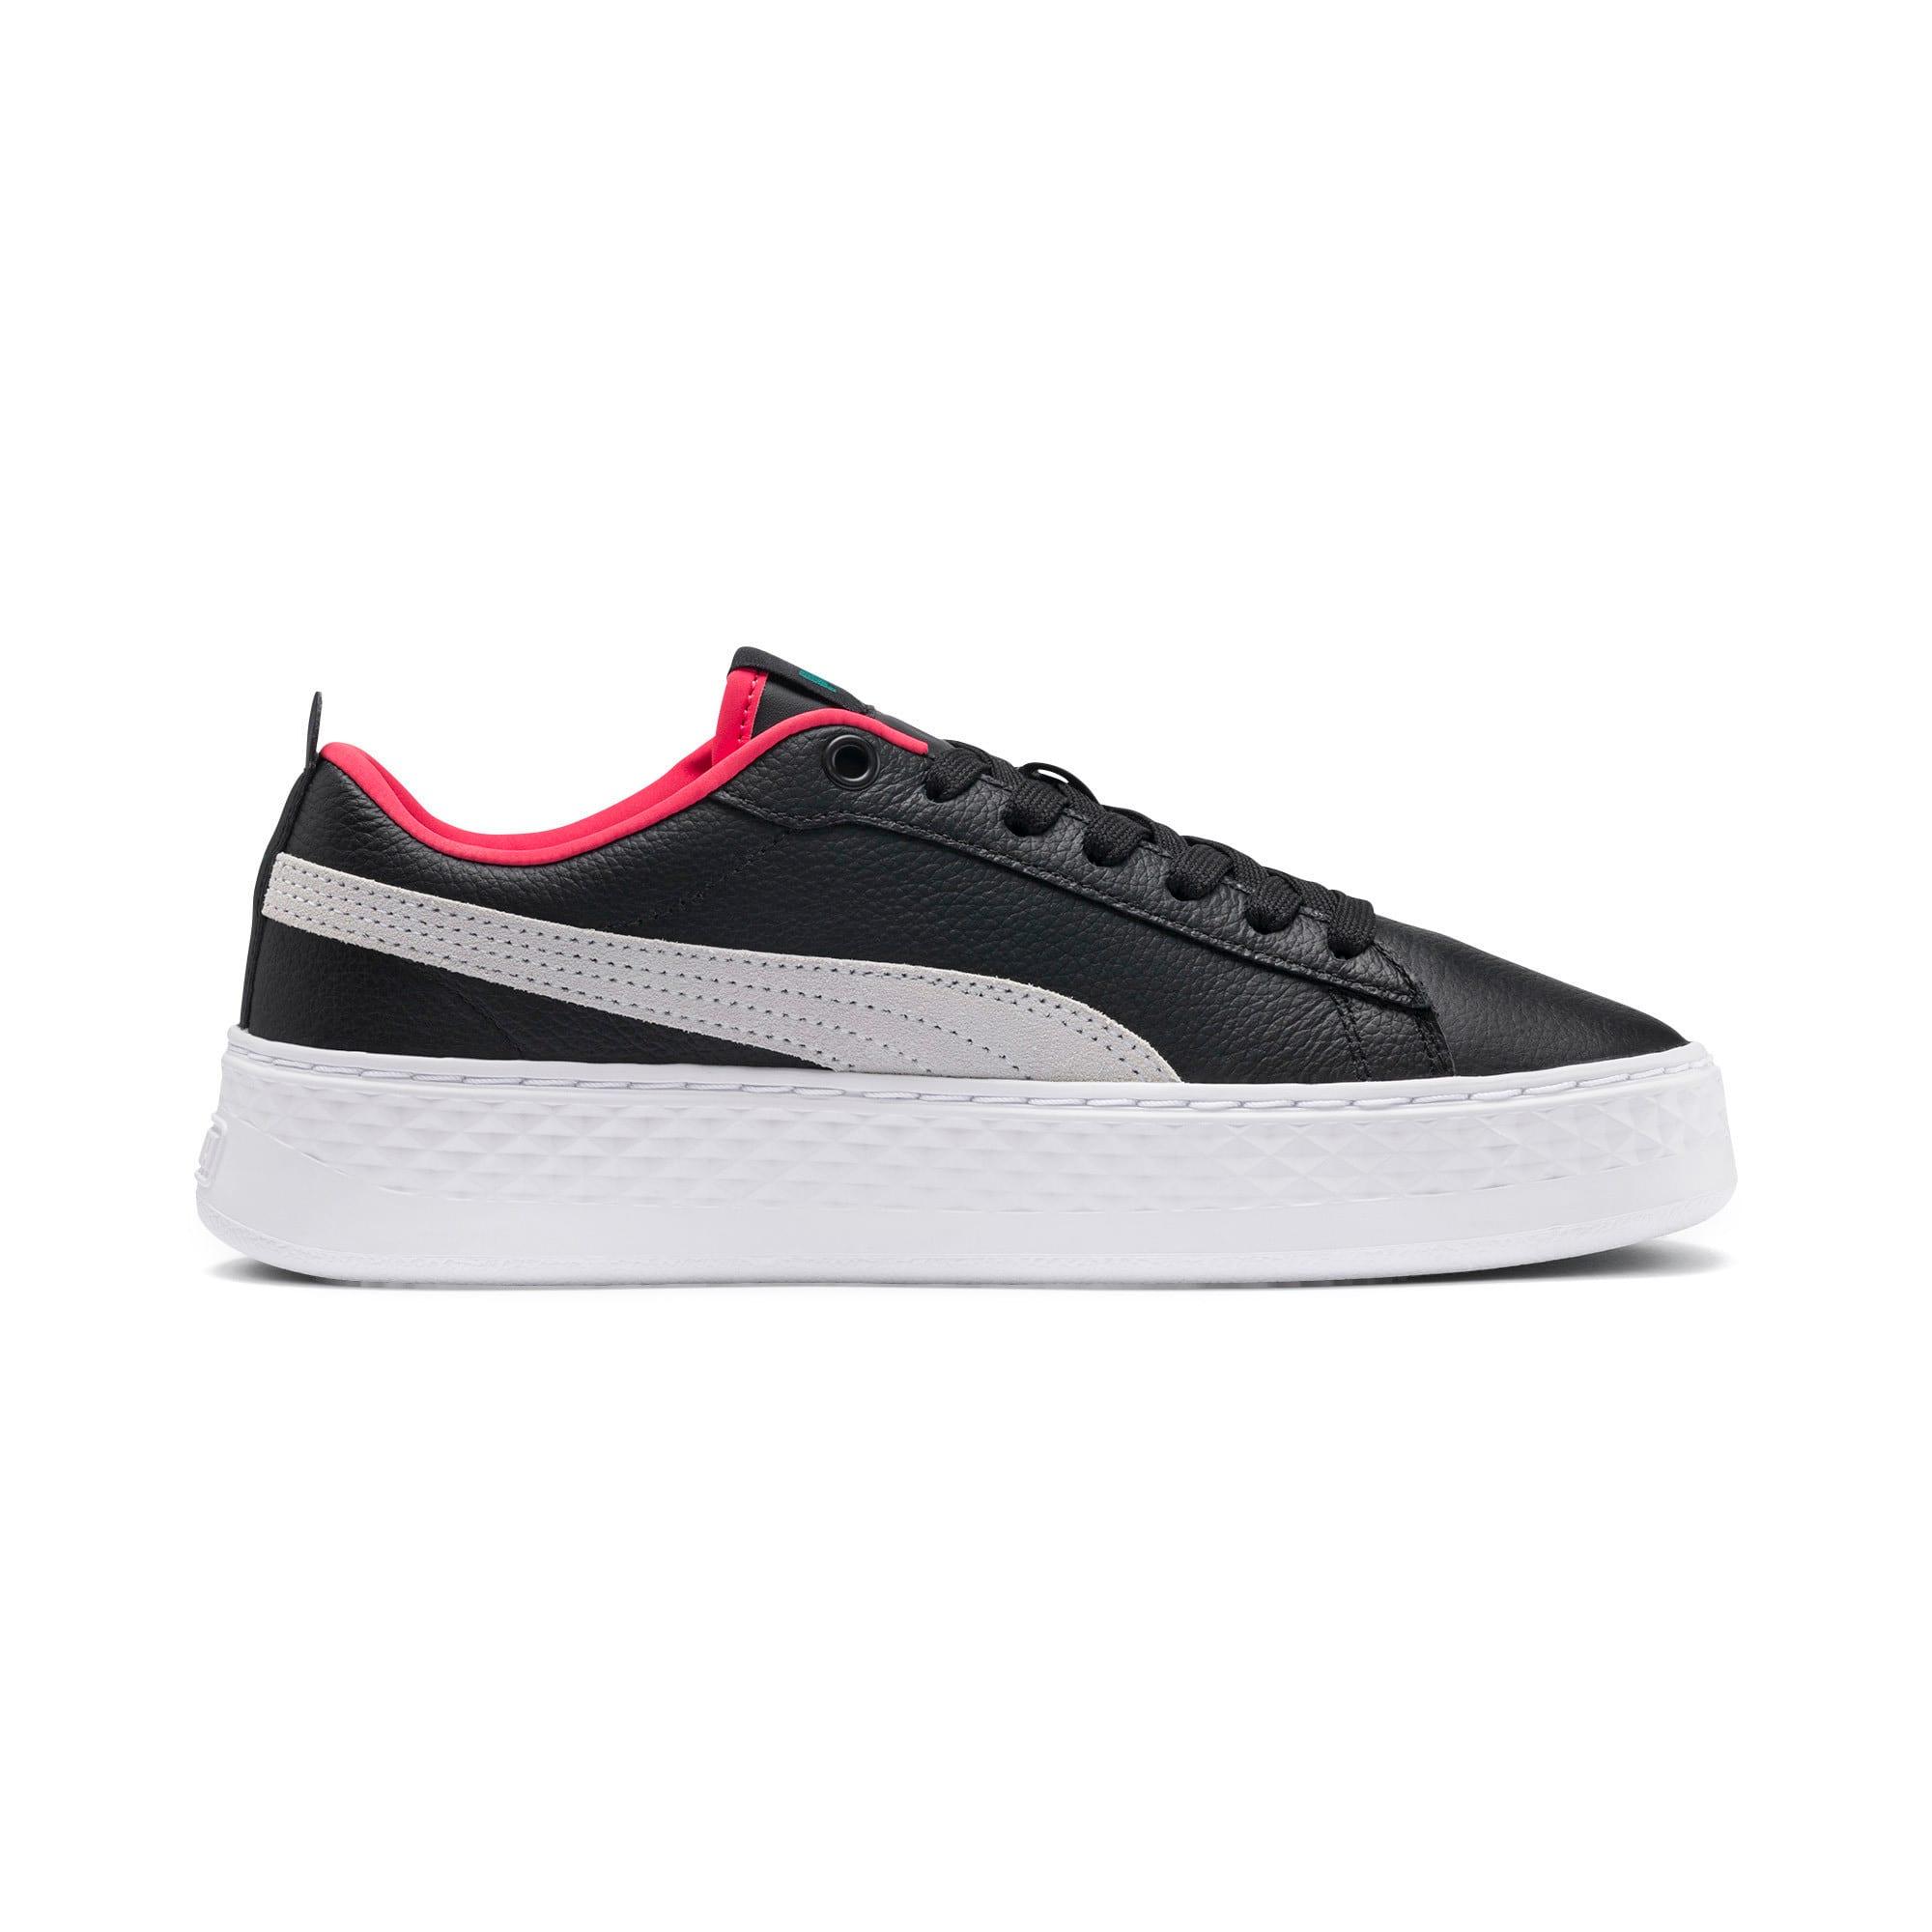 Thumbnail 7 of Puma Smash Platform Women's Shoes, Black-White-T Green-C Coral, medium-IND